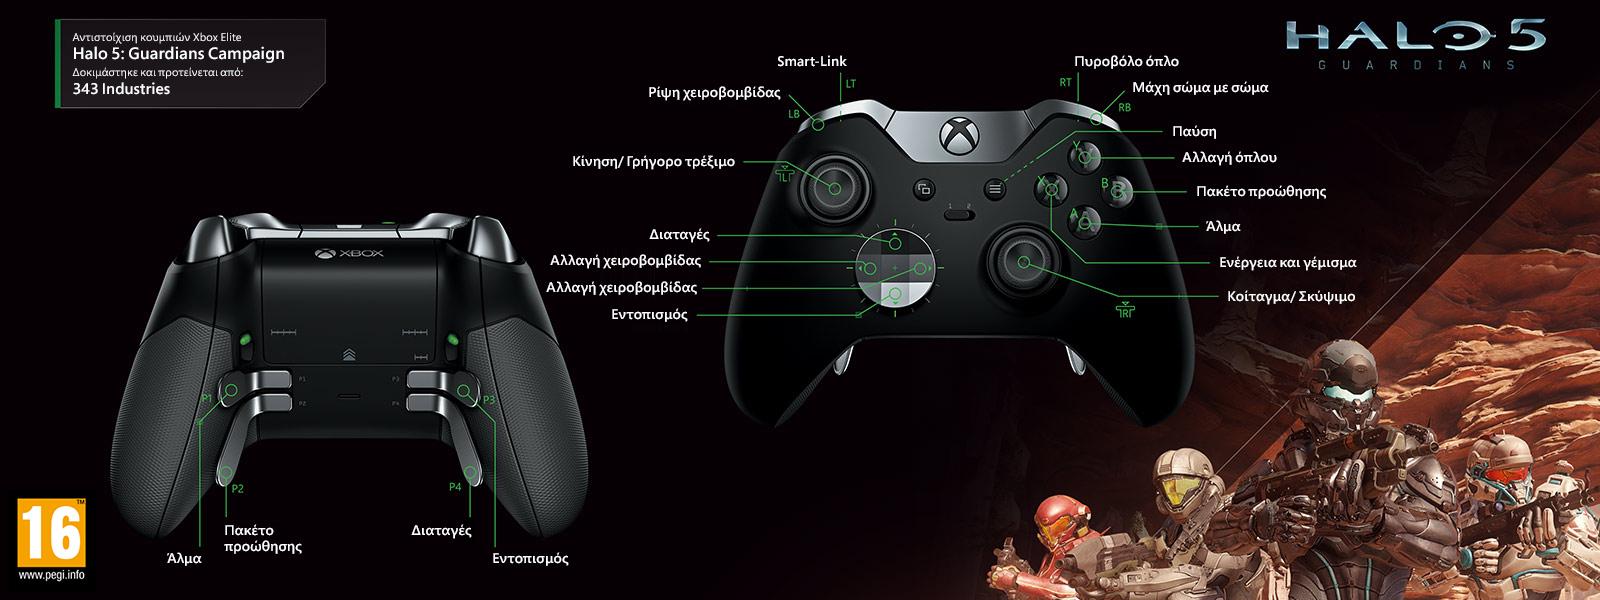 Halo 5 – Χαρτογράφηση Guardians Campaign Elite